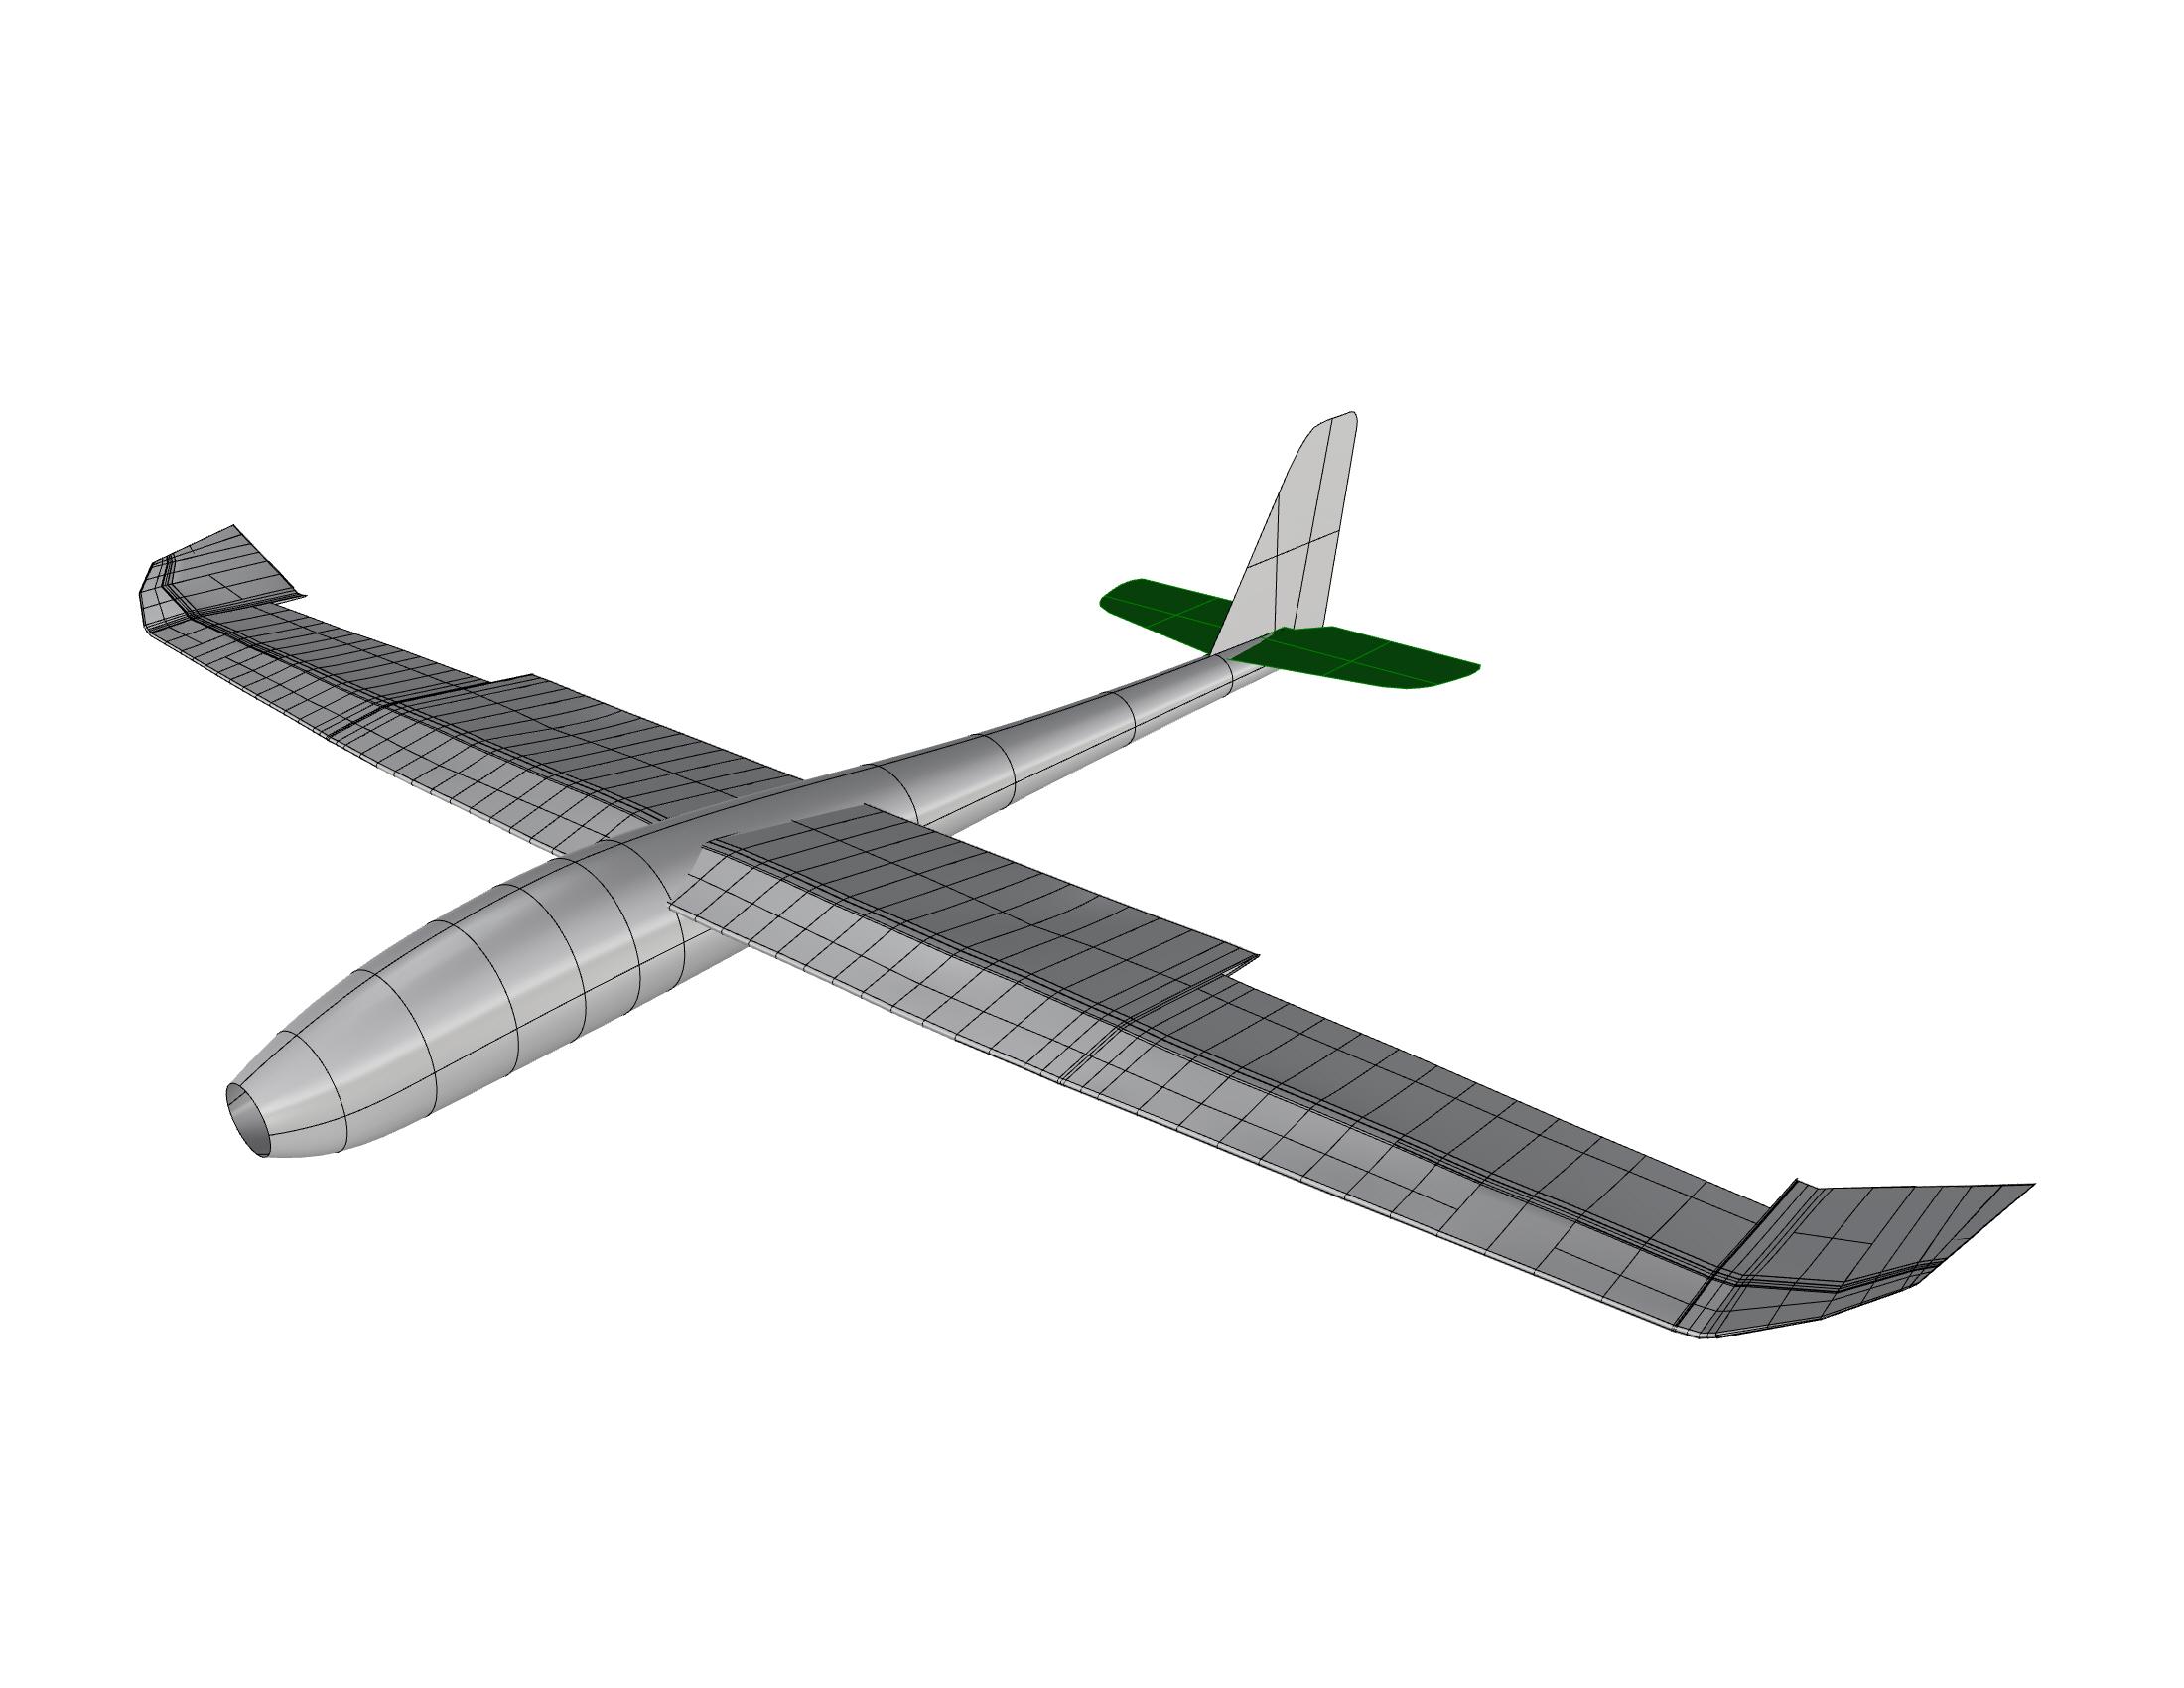 3D Model Picture 5.jpg